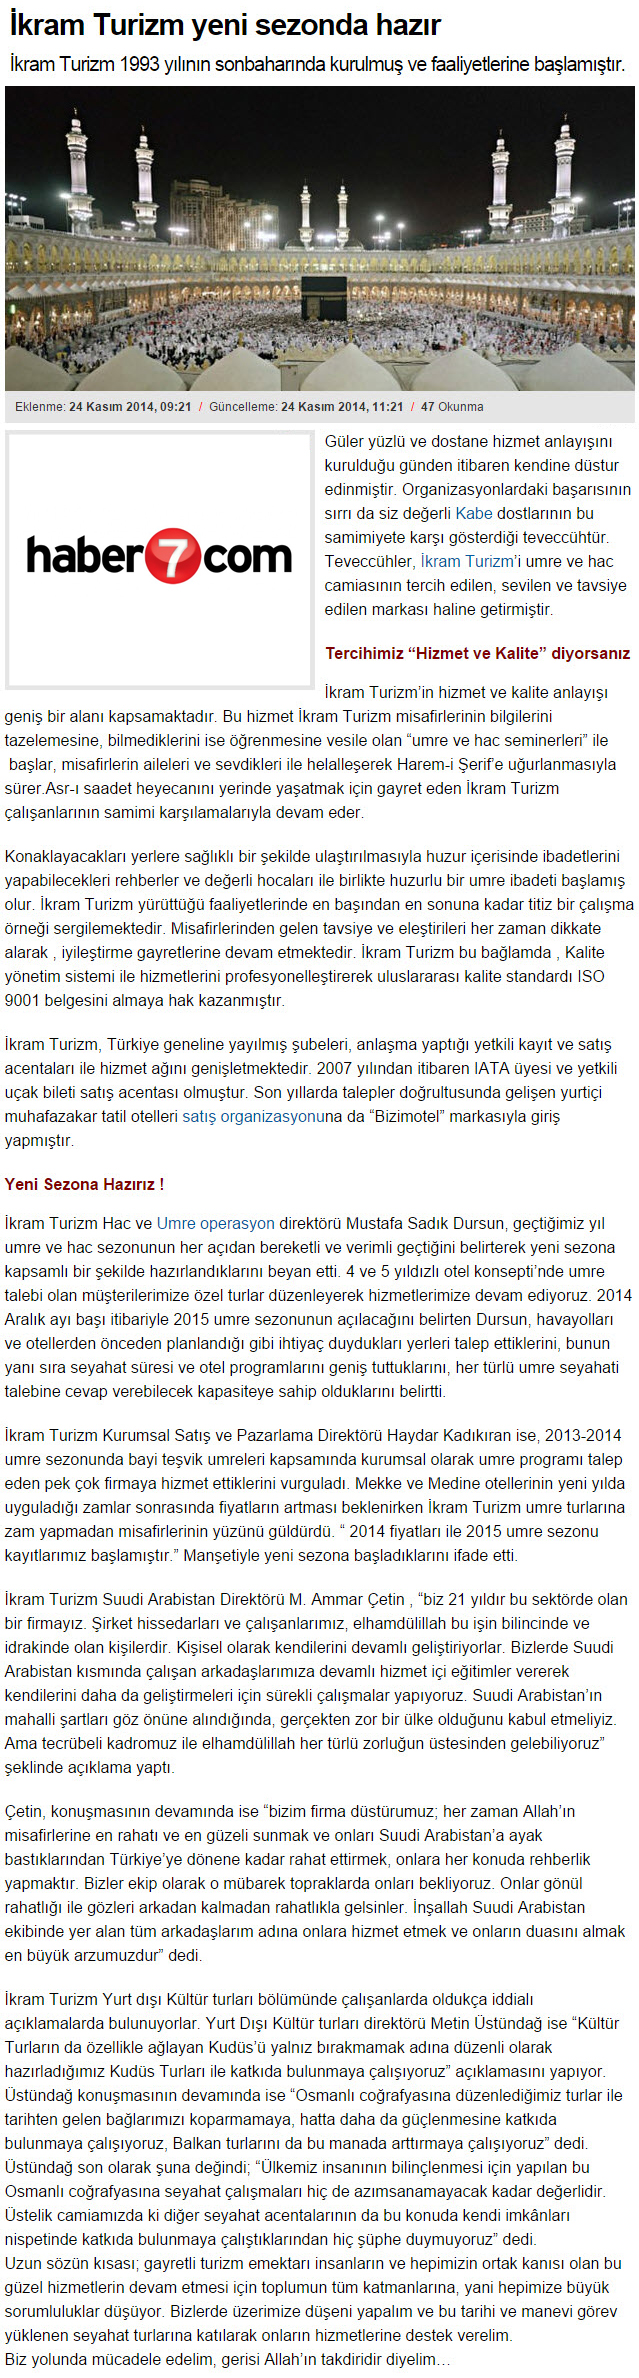 haber7-2.jpg